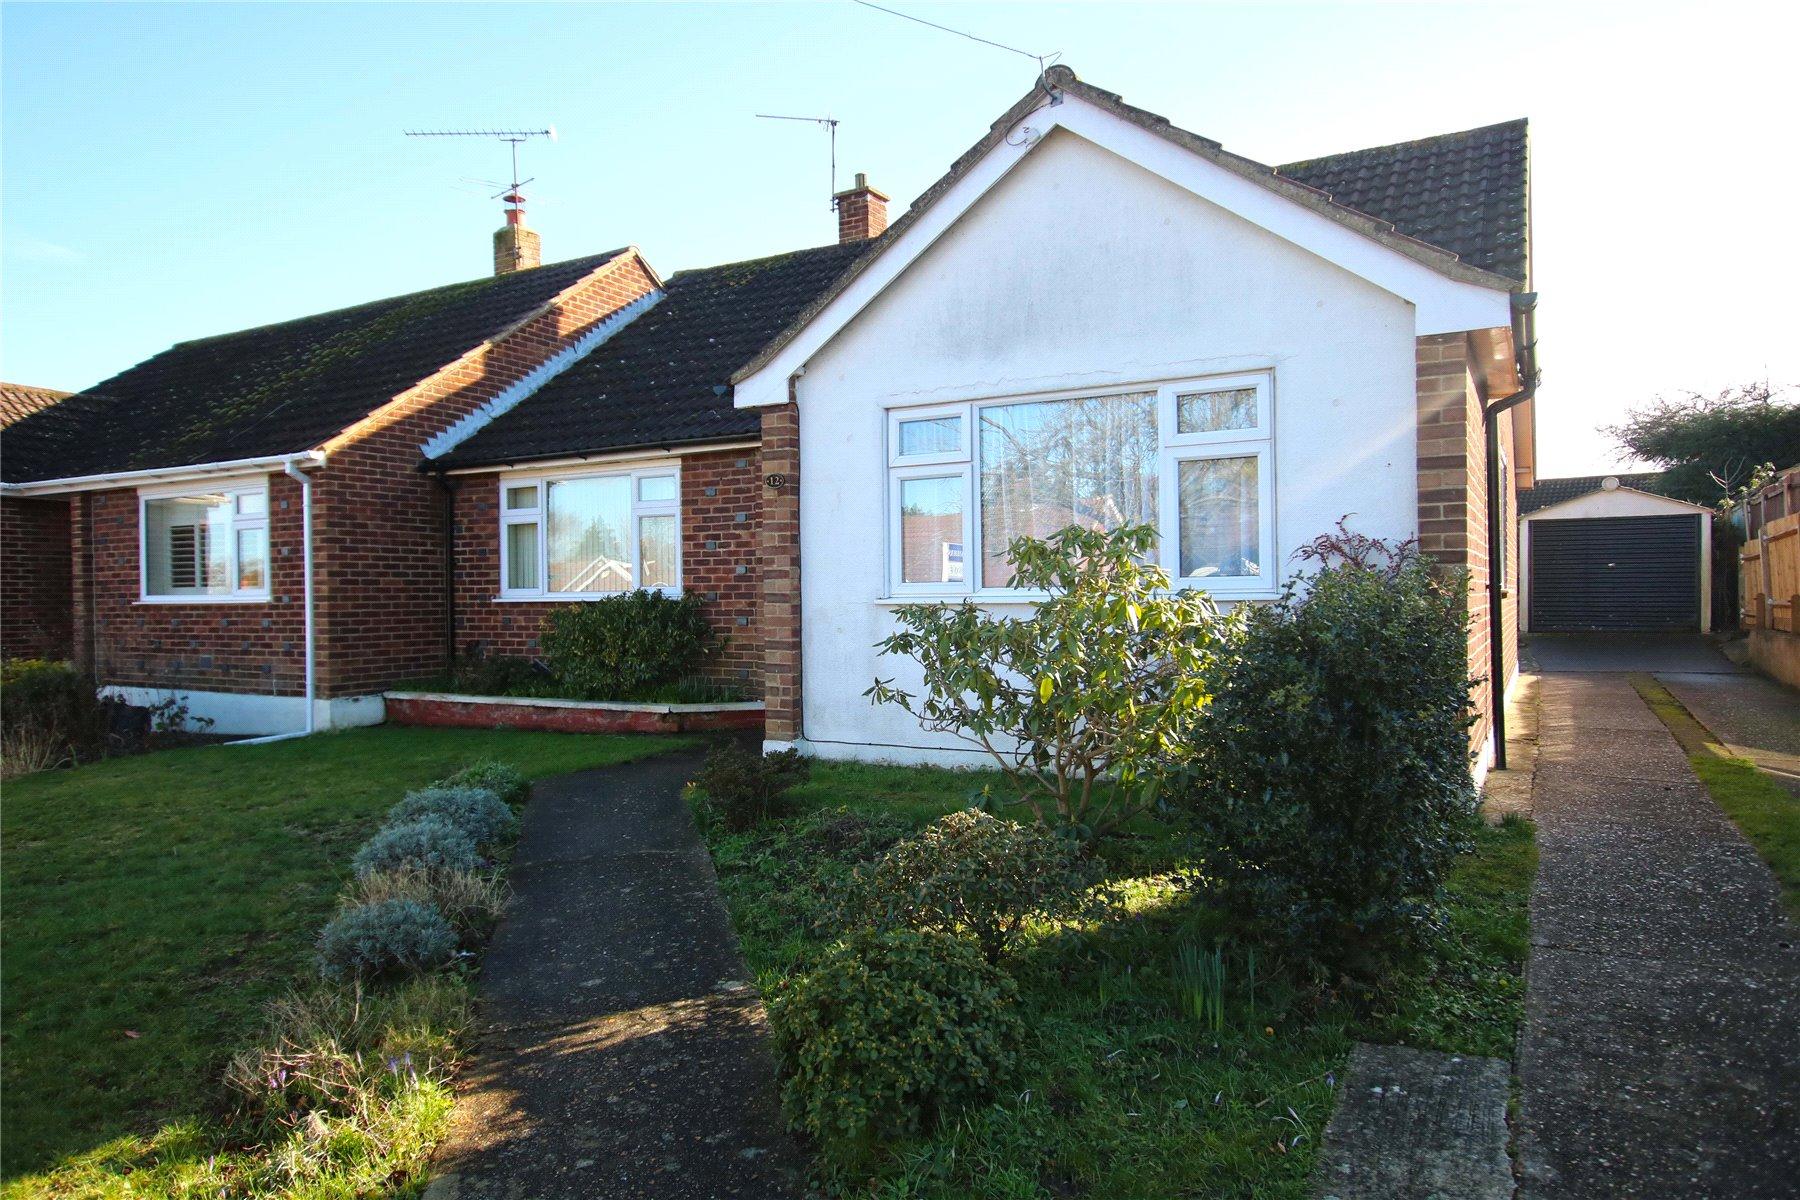 3 Bedrooms Semi Detached Bungalow for sale in Romans Way, Pyrford, Surrey, GU22